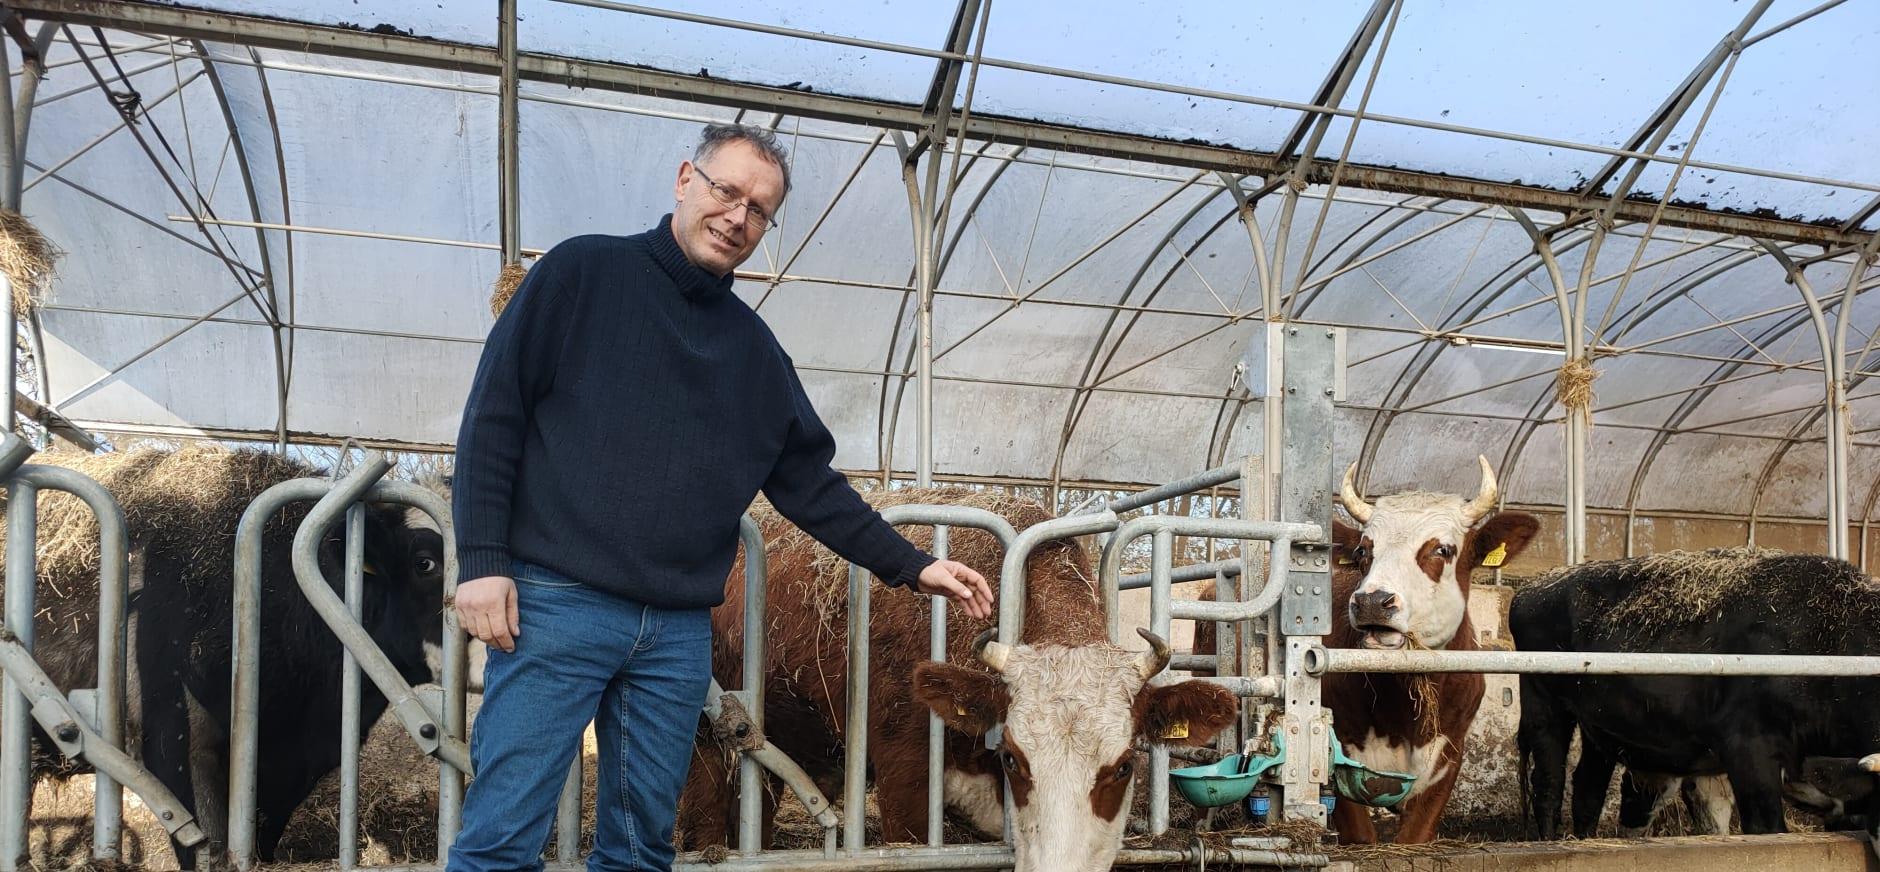 Boer Jeroen van der Kooij van Hoeve Rust-hoff in Maasland